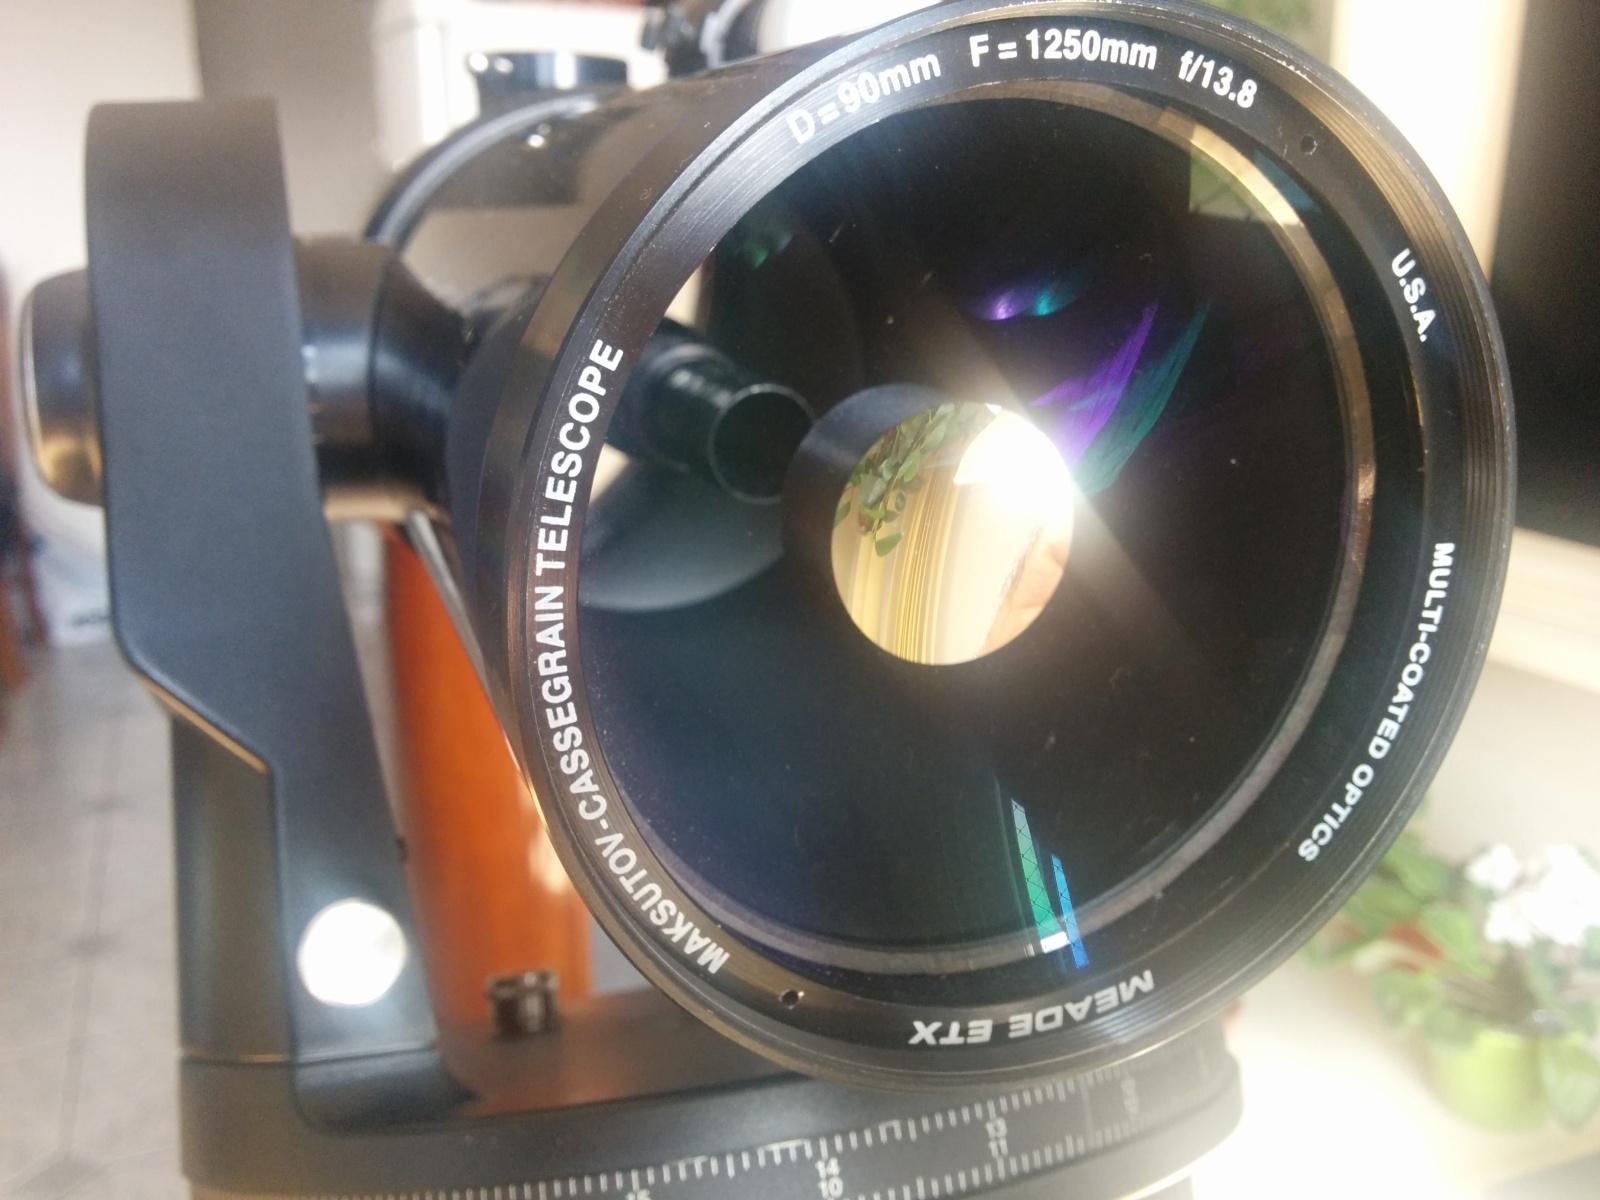 Meade ETX 90mm RA 2q013s2